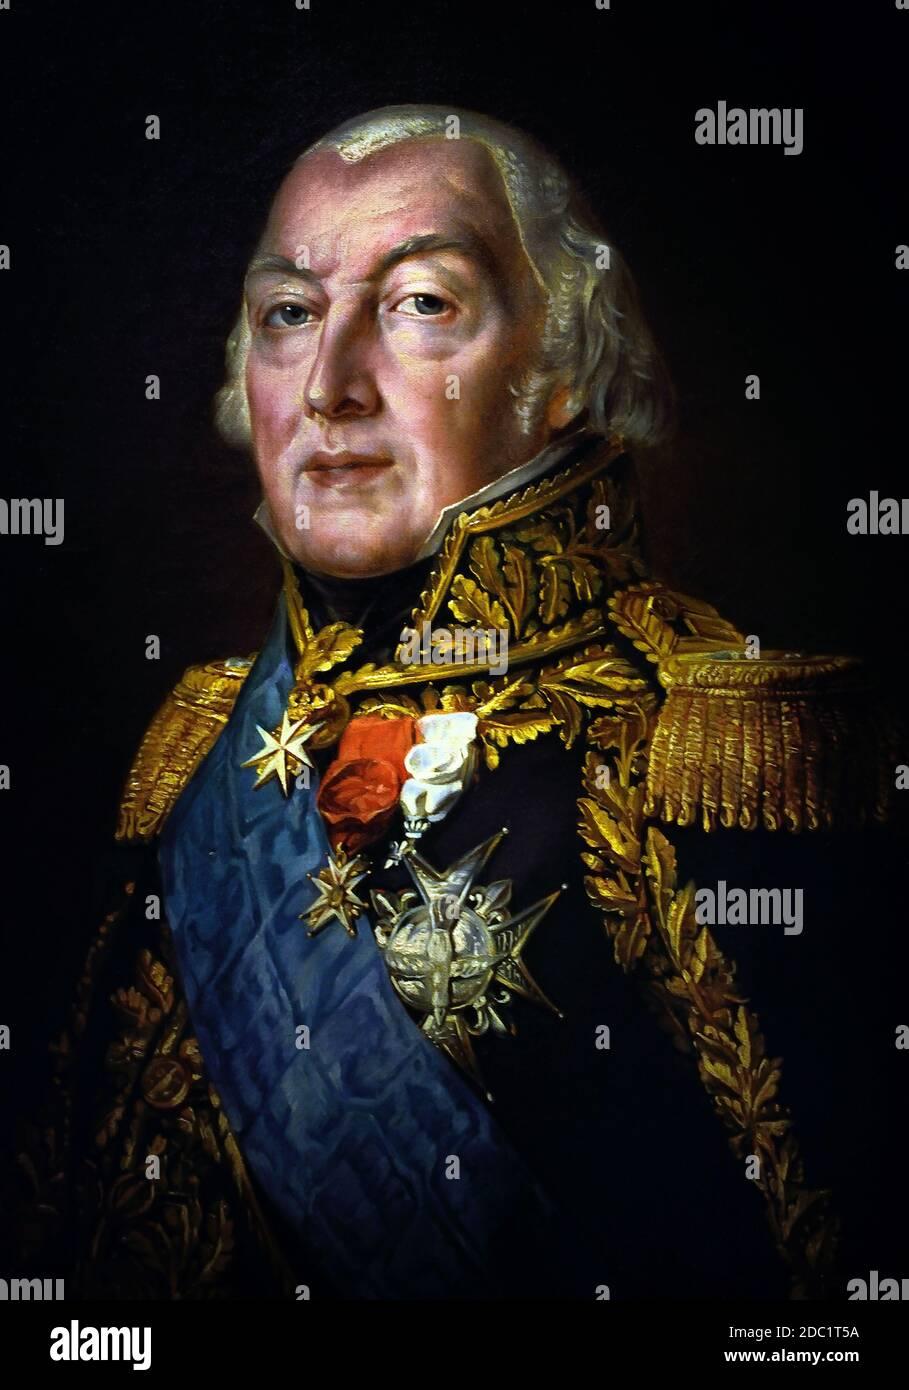 François-Henri de Franquetot de Coigny, duque de Coigny 1737 – 1821 Mariscal de Francia, francés. ( ejército del emperador Napoleón Bonaparte ) Foto de stock